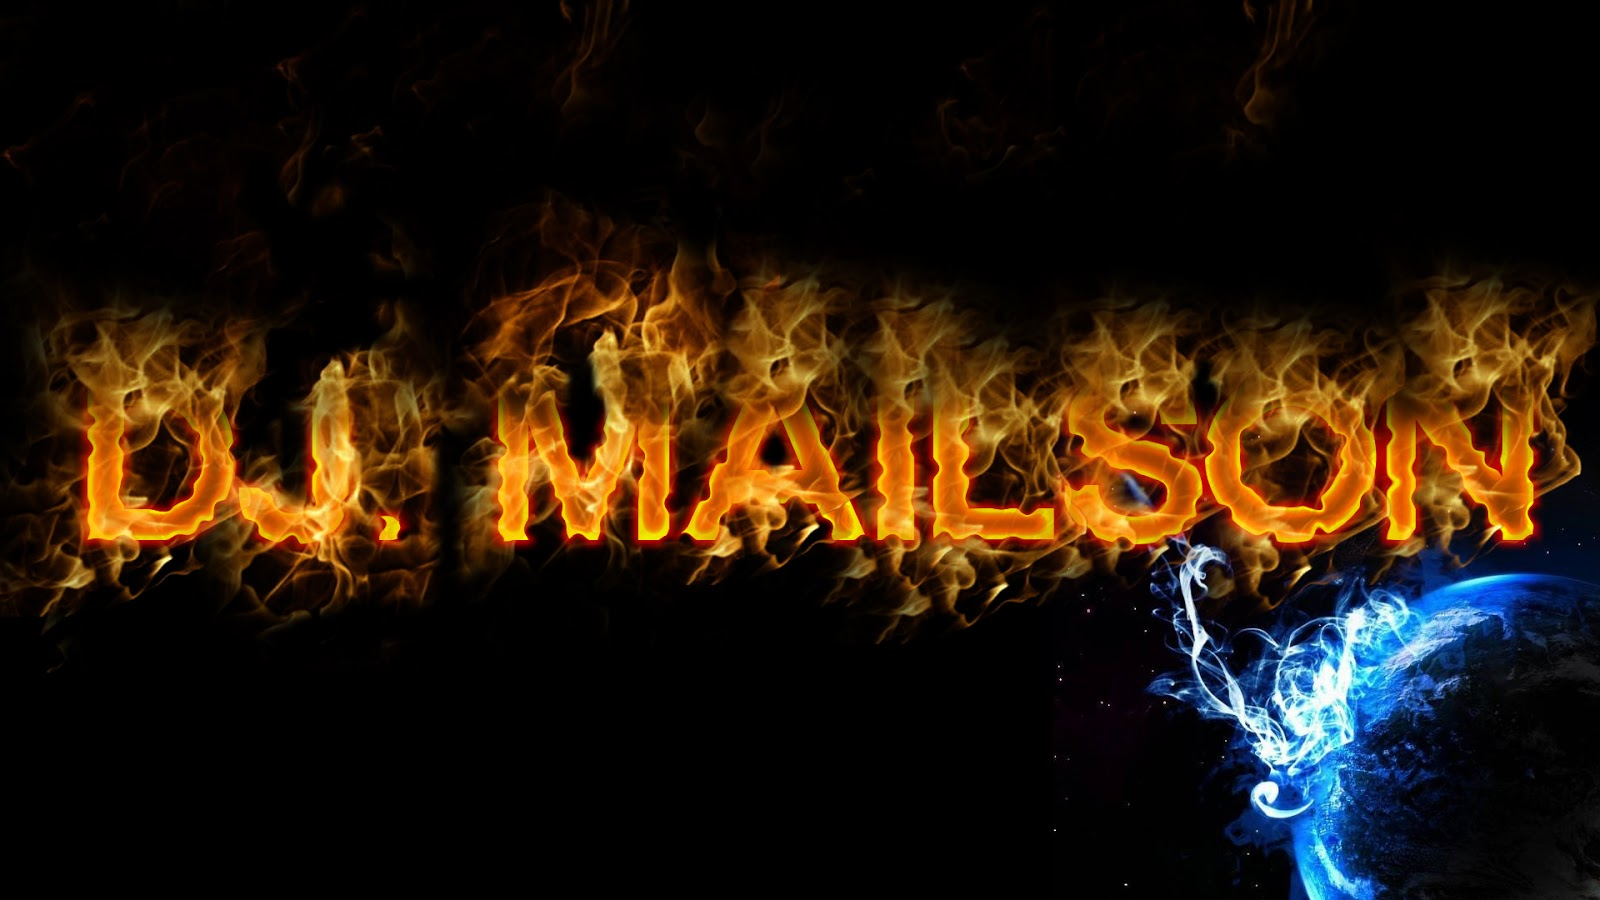 http://4.bp.blogspot.com/-sR-LYqWv0U4/UO-ApJ_LM4I/AAAAAAAAKM0/3TWblfvvfn0/s1600/DJ.+Mailson+De+Fogo.jpg